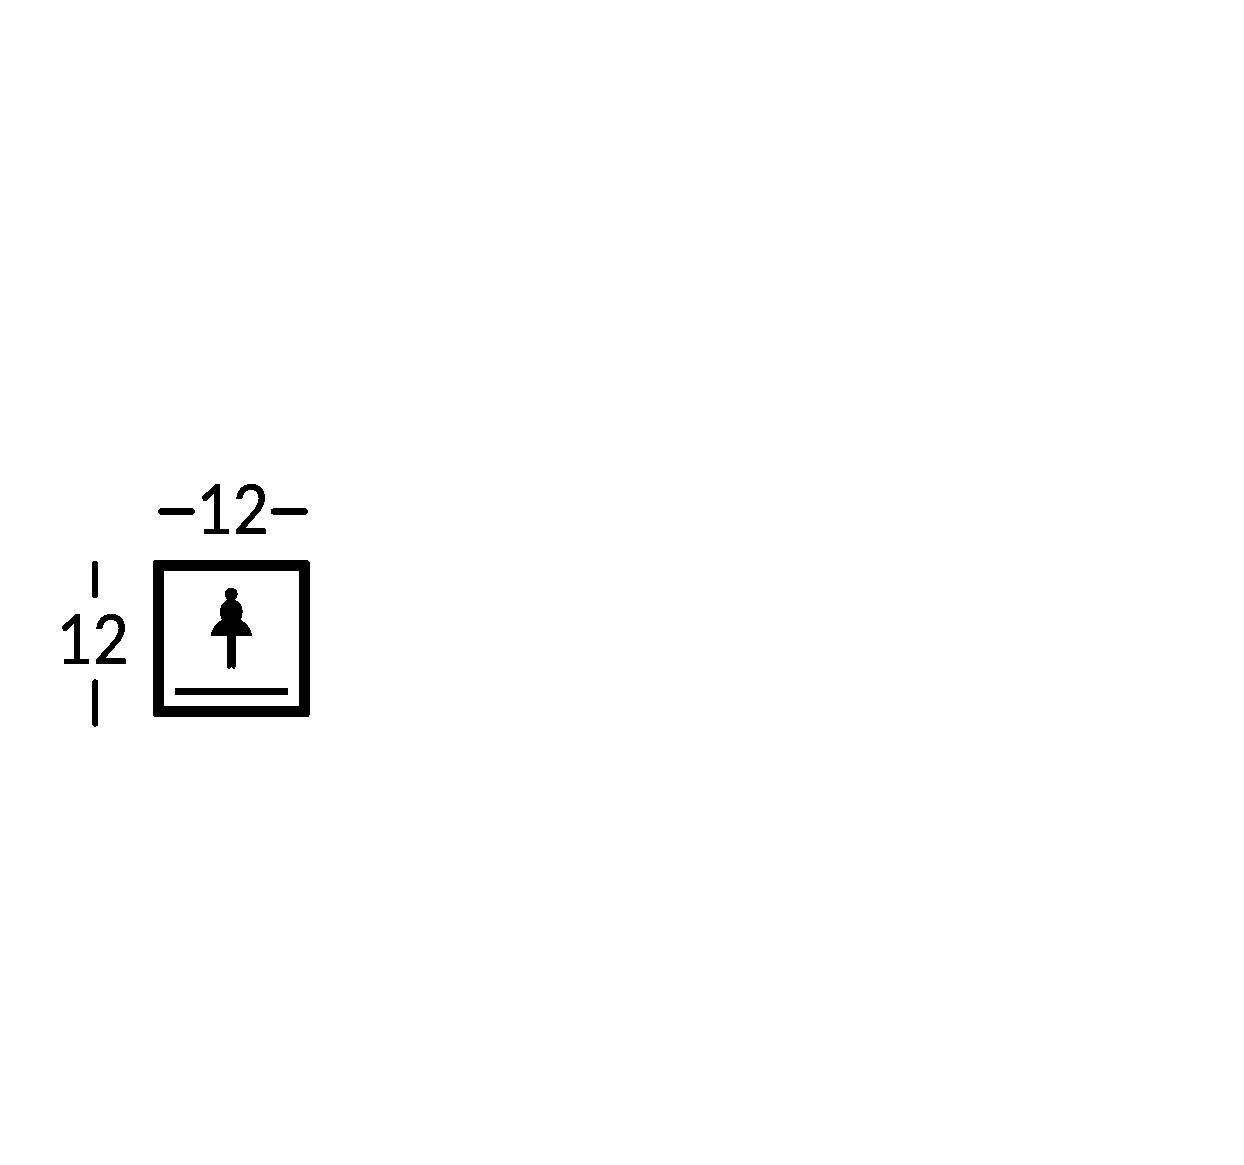 Placa con símbolo. Línea York.